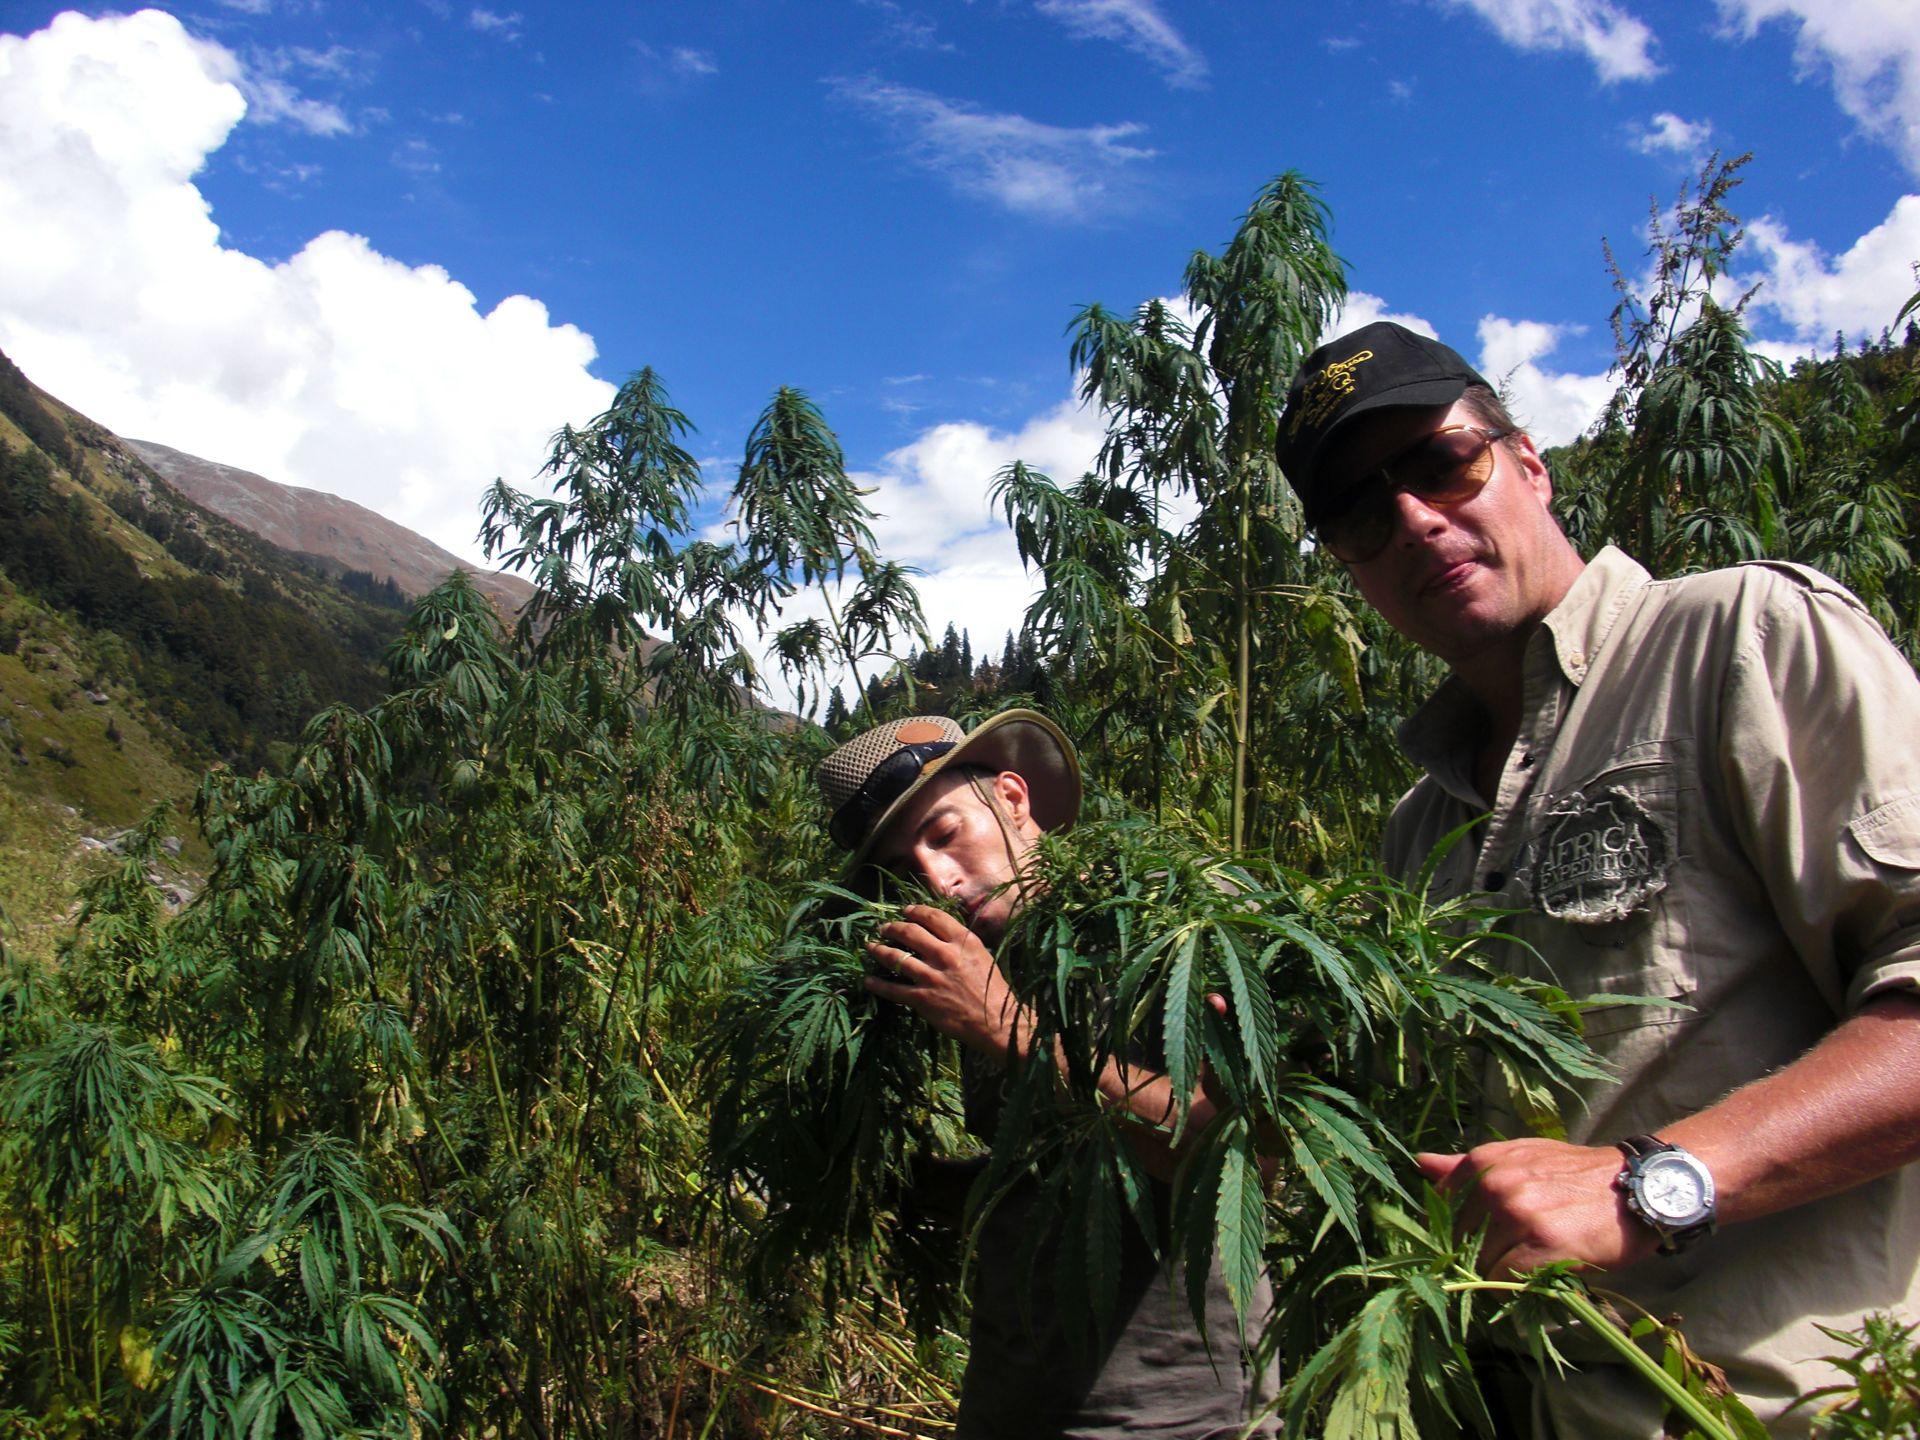 how to make money from marijuana in canada legl